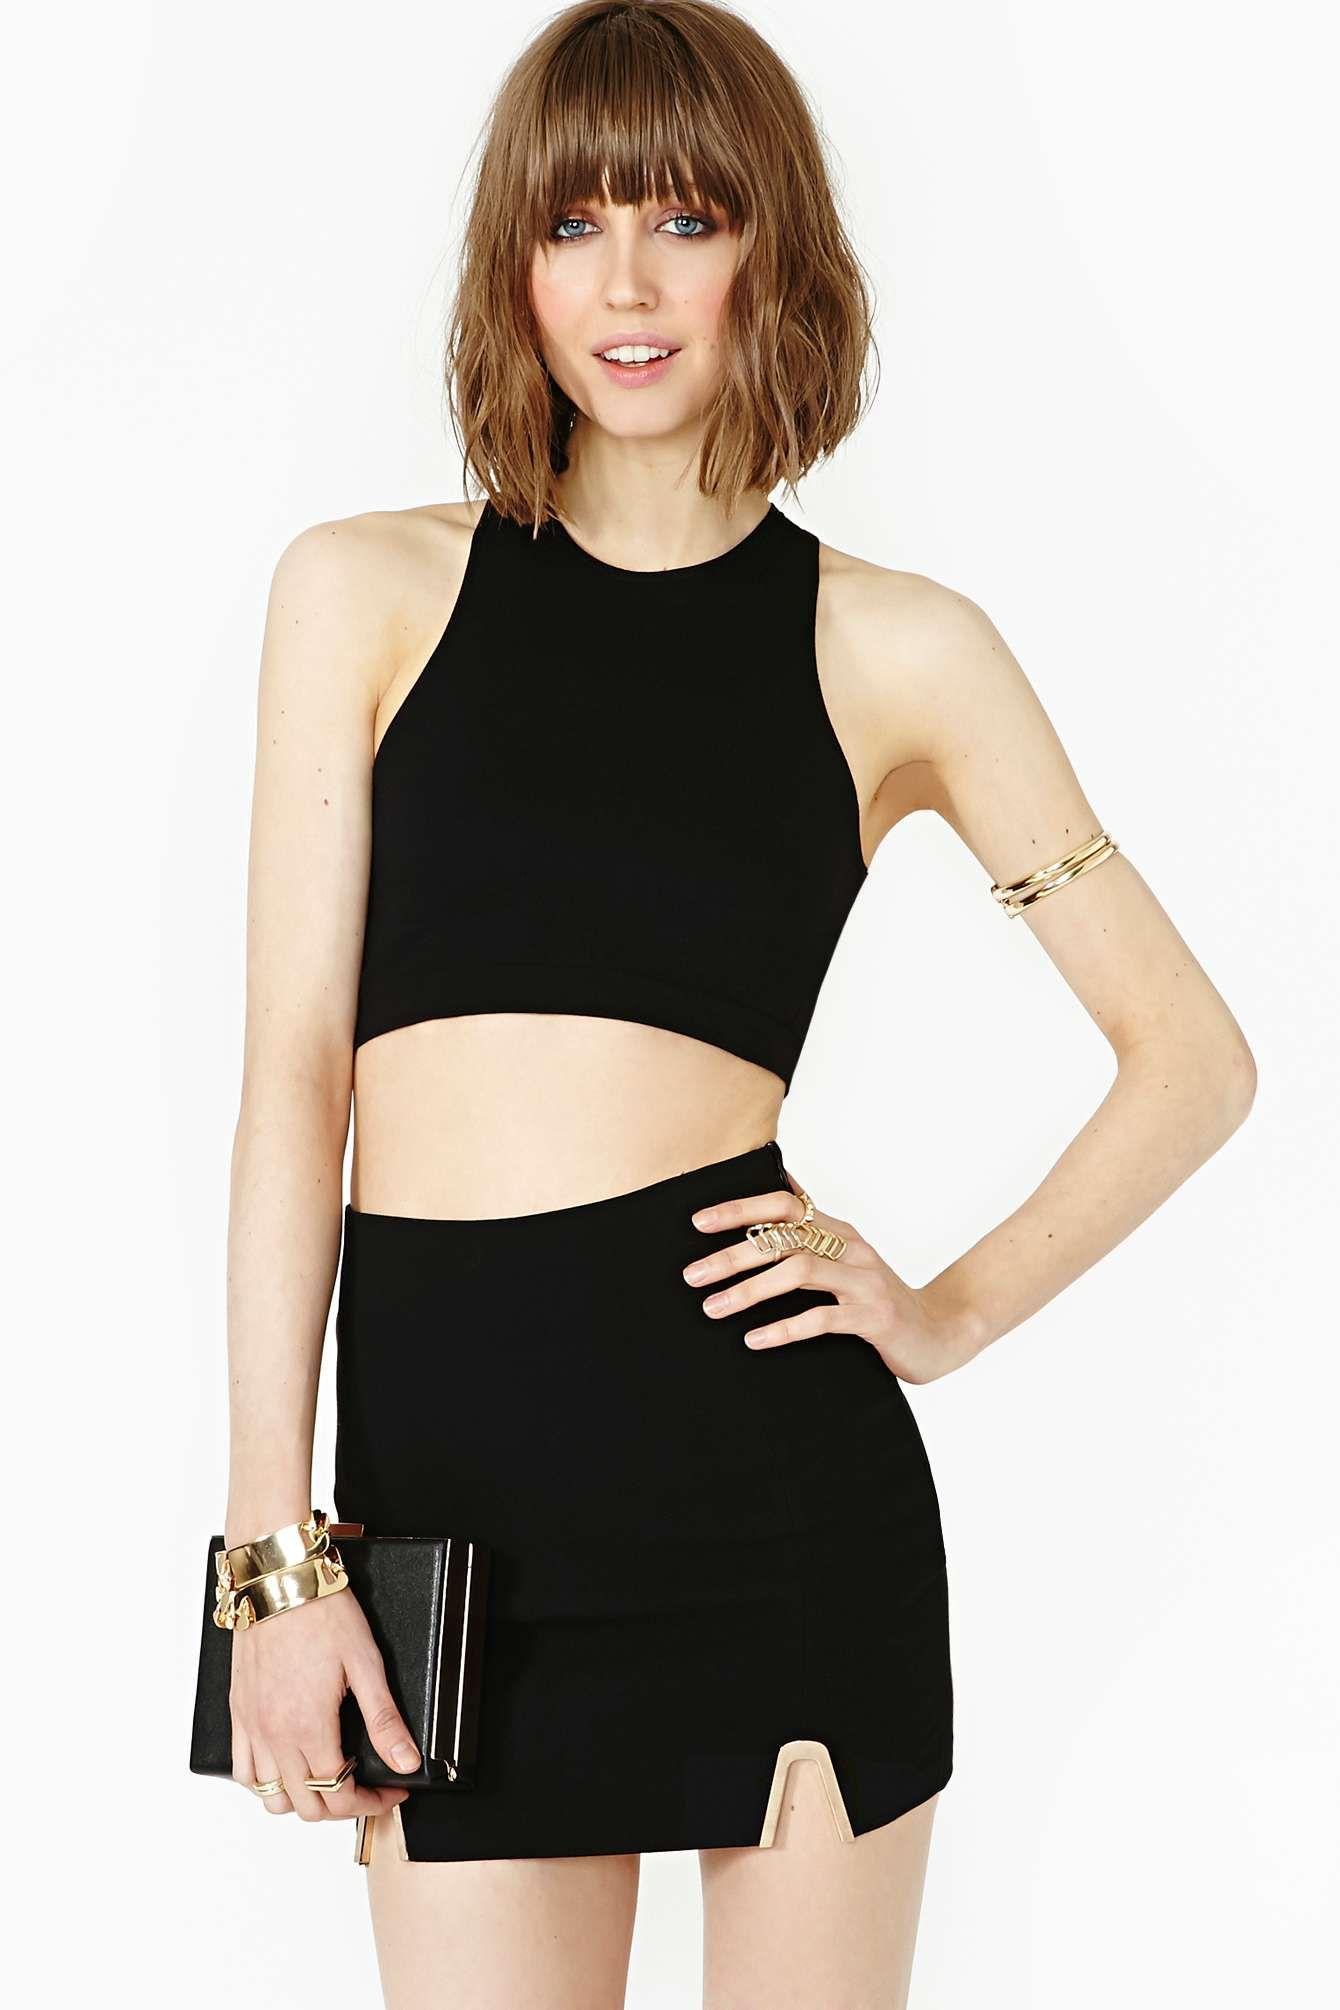 Hard line skirt womenus fashion pinterest stylish girl